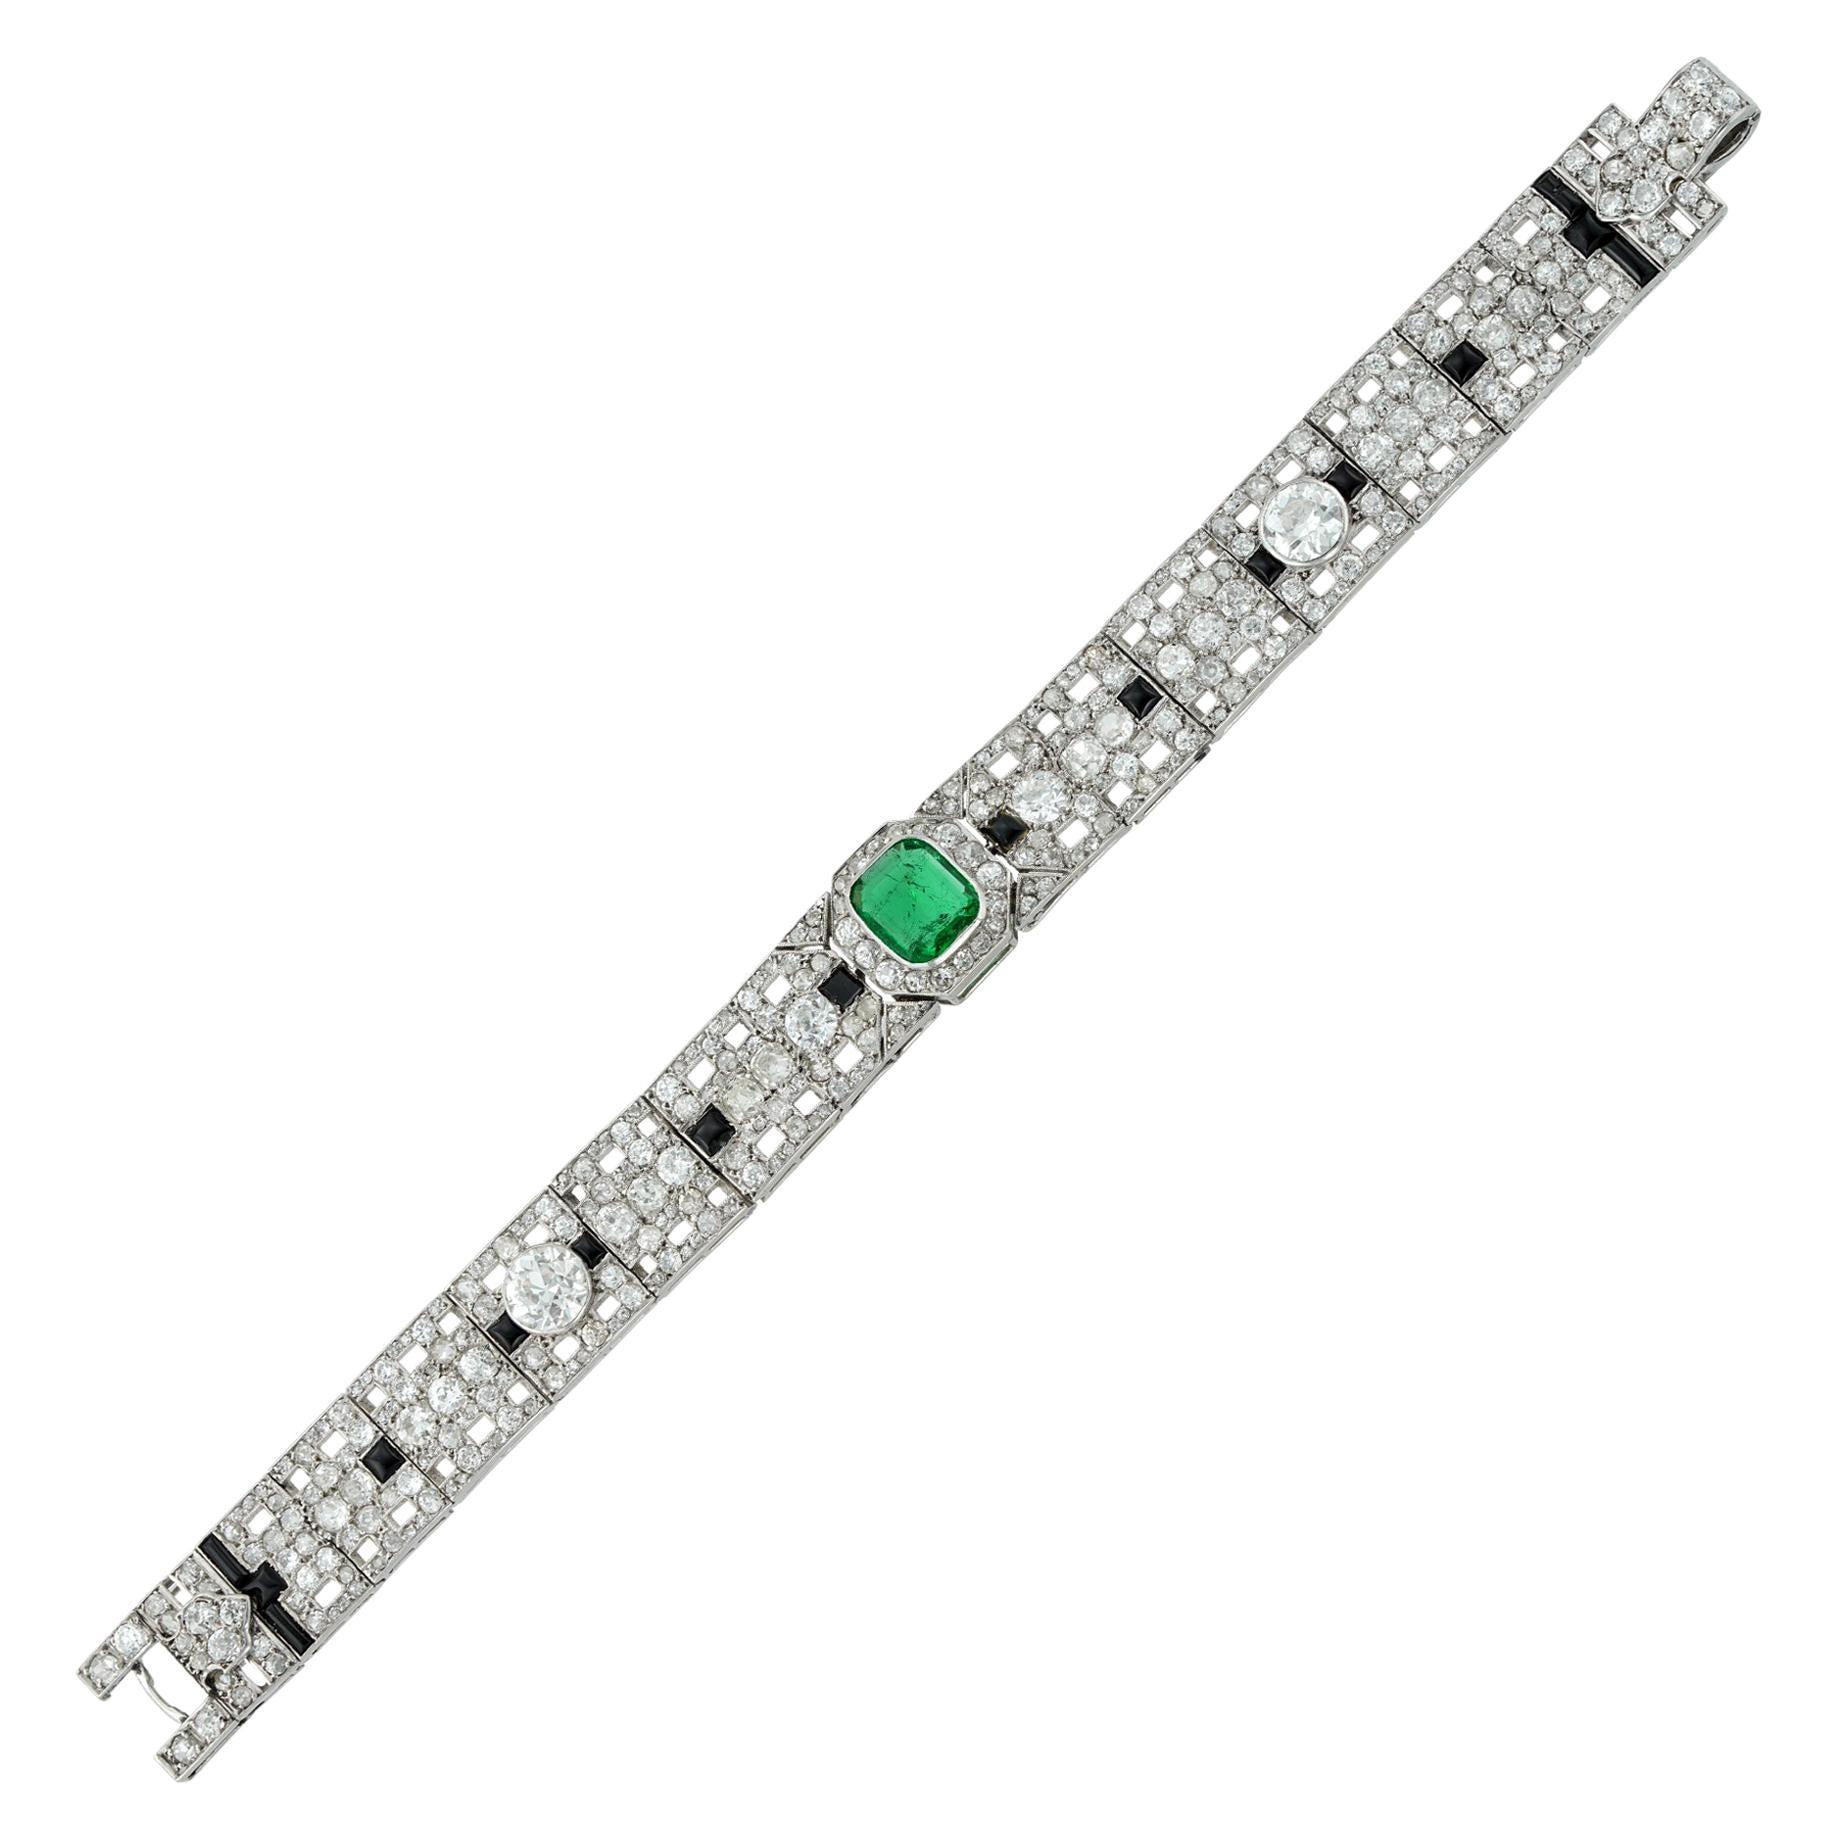 Fine Art Deco Emerald, Onyx and Diamond Bracelet